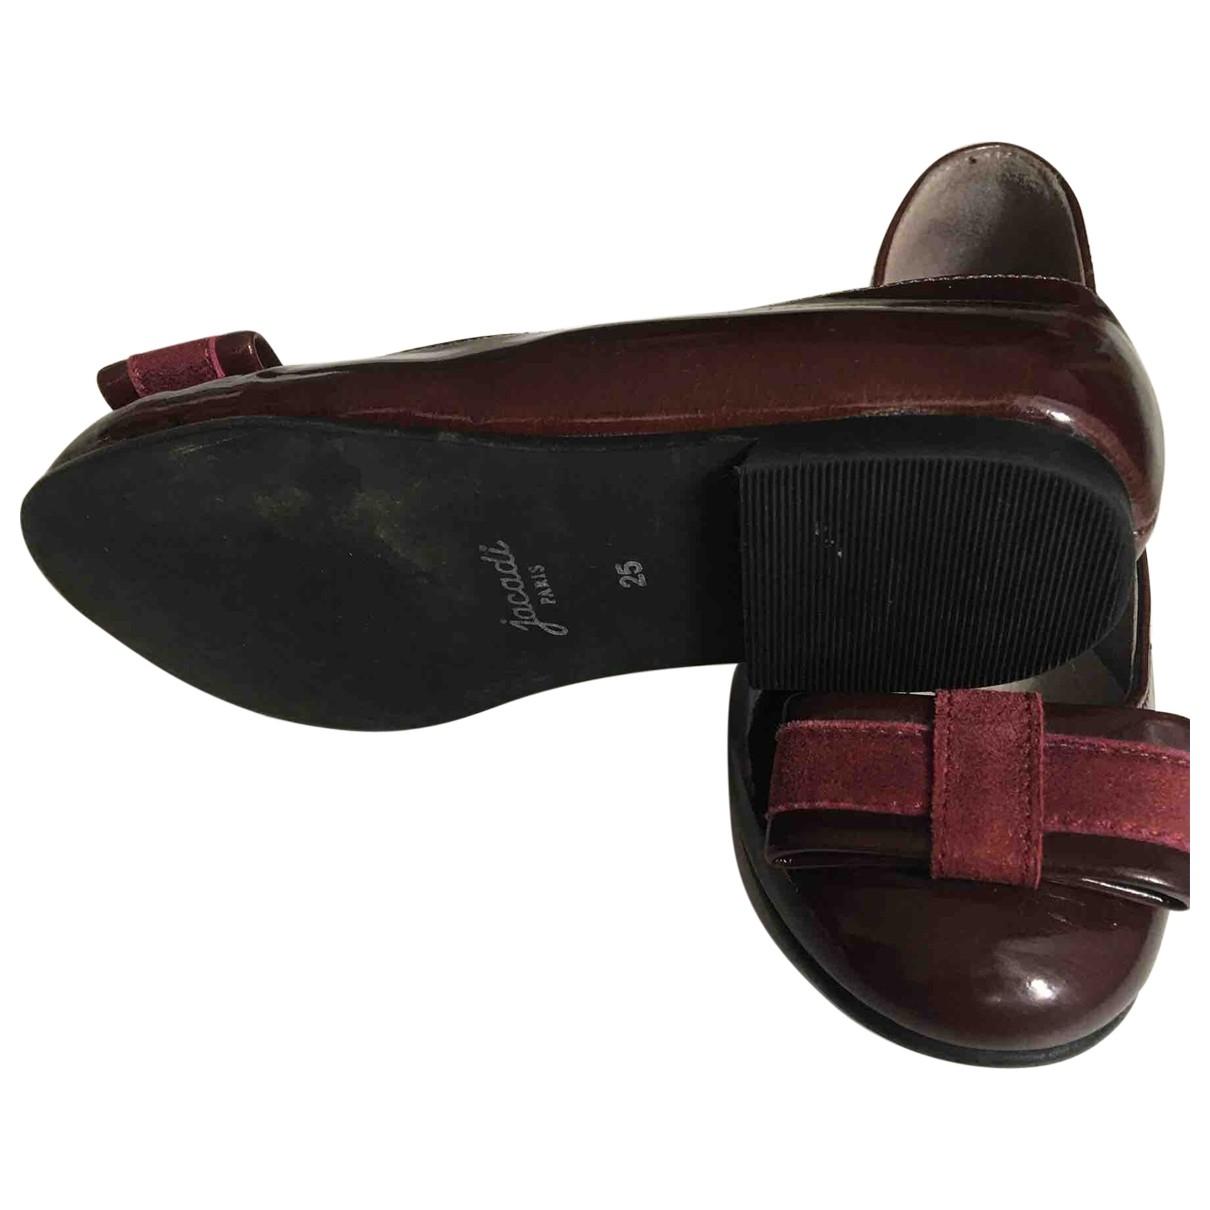 Jacadi \N Burgundy Patent leather Ballet flats for Kids 25 EU